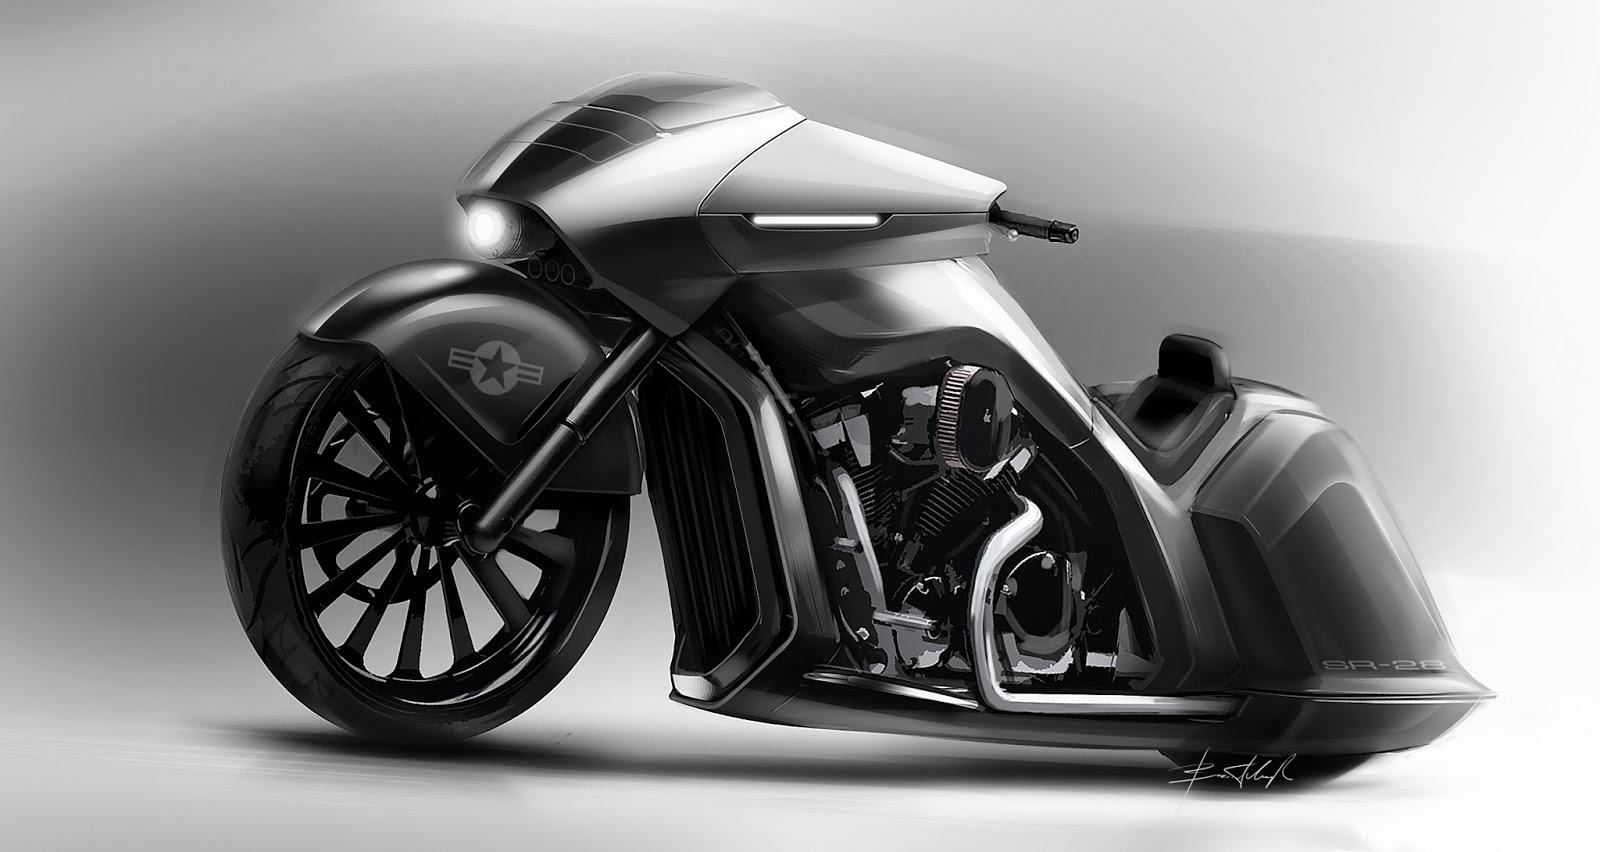 small resolution of sr 28 custom motorcycle based on honda vtx 1800